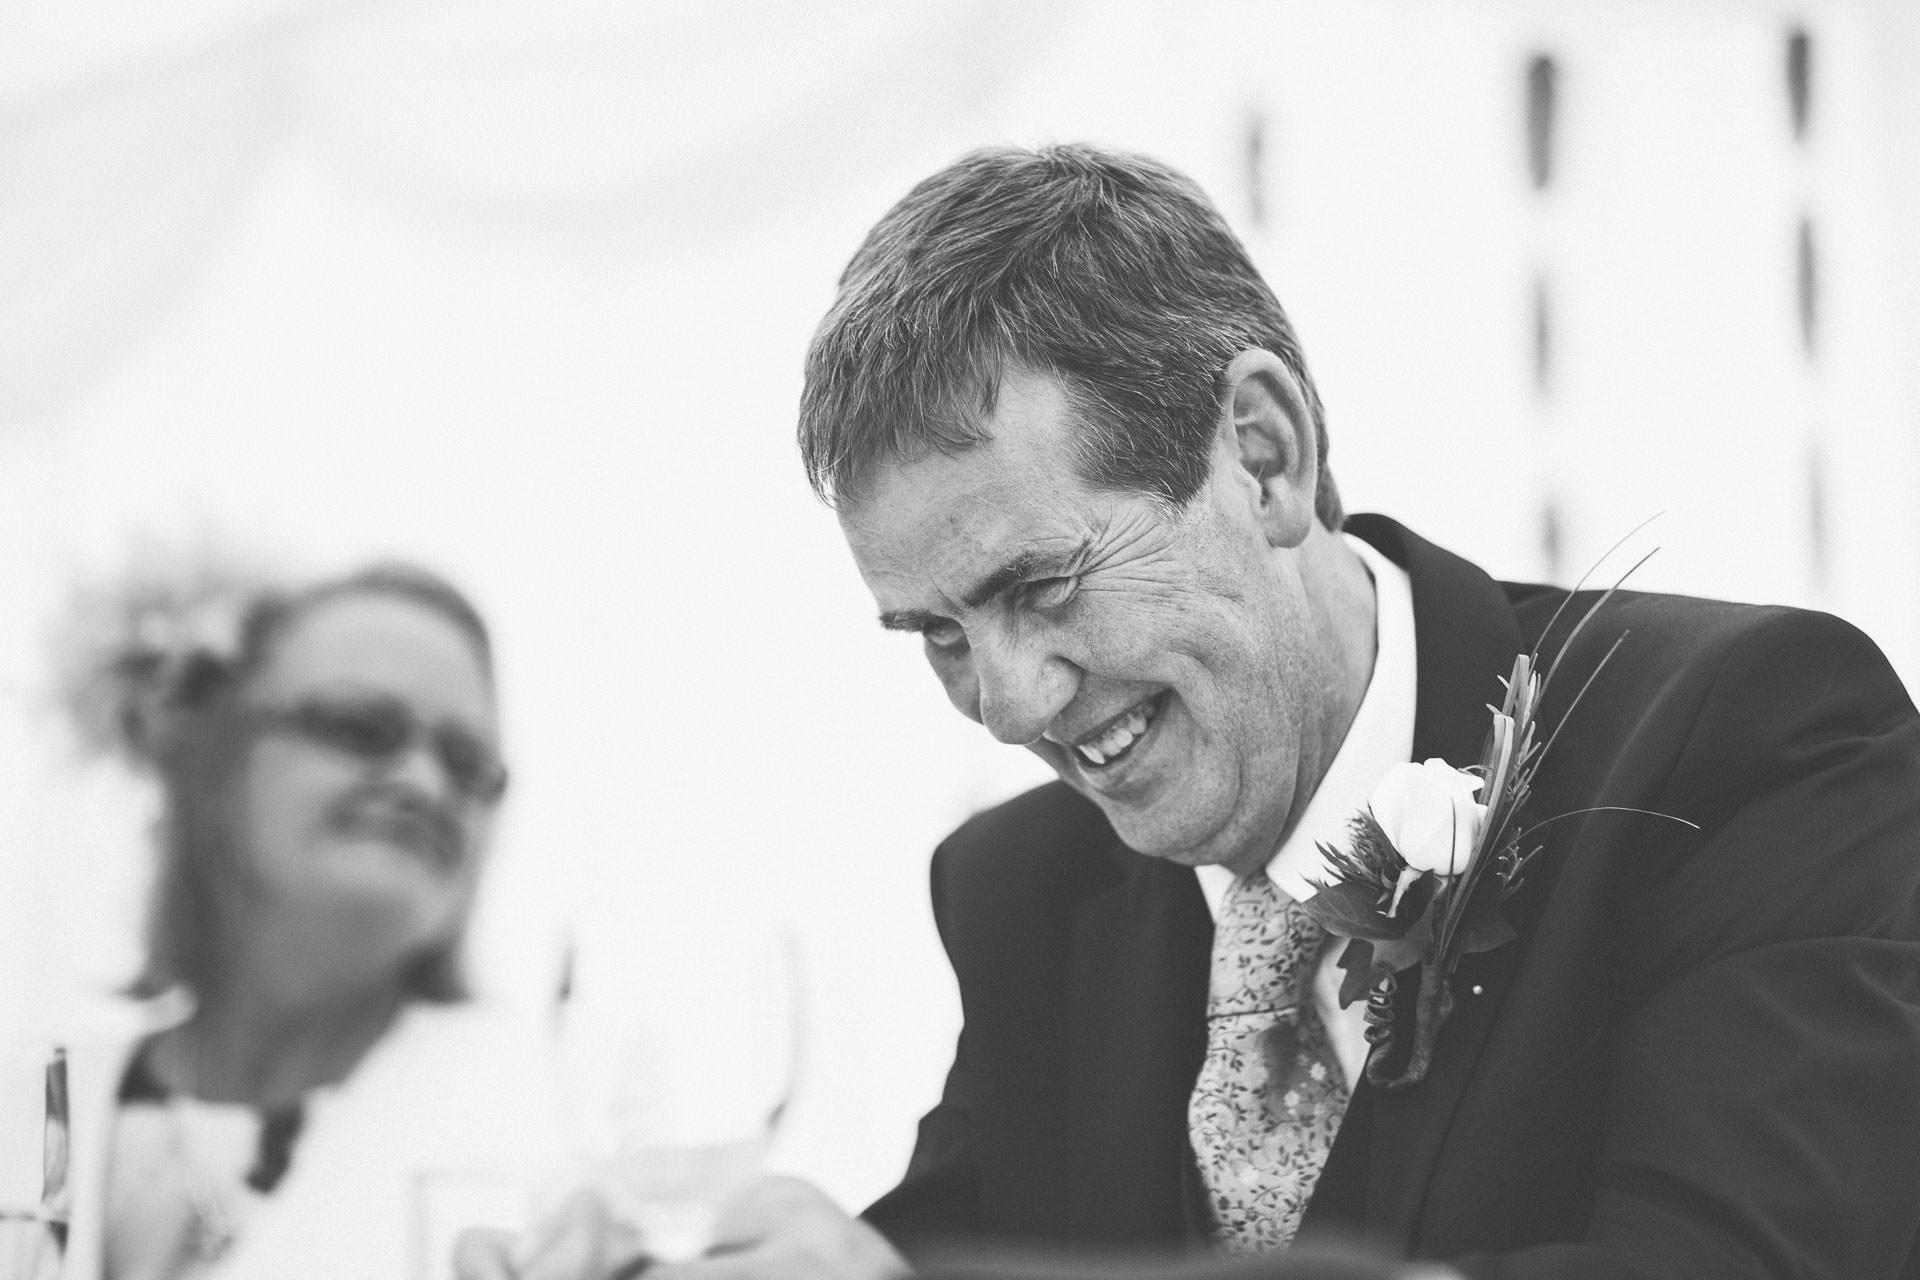 cheshire-rustic-farm-wedding-photography-helen-simon-64